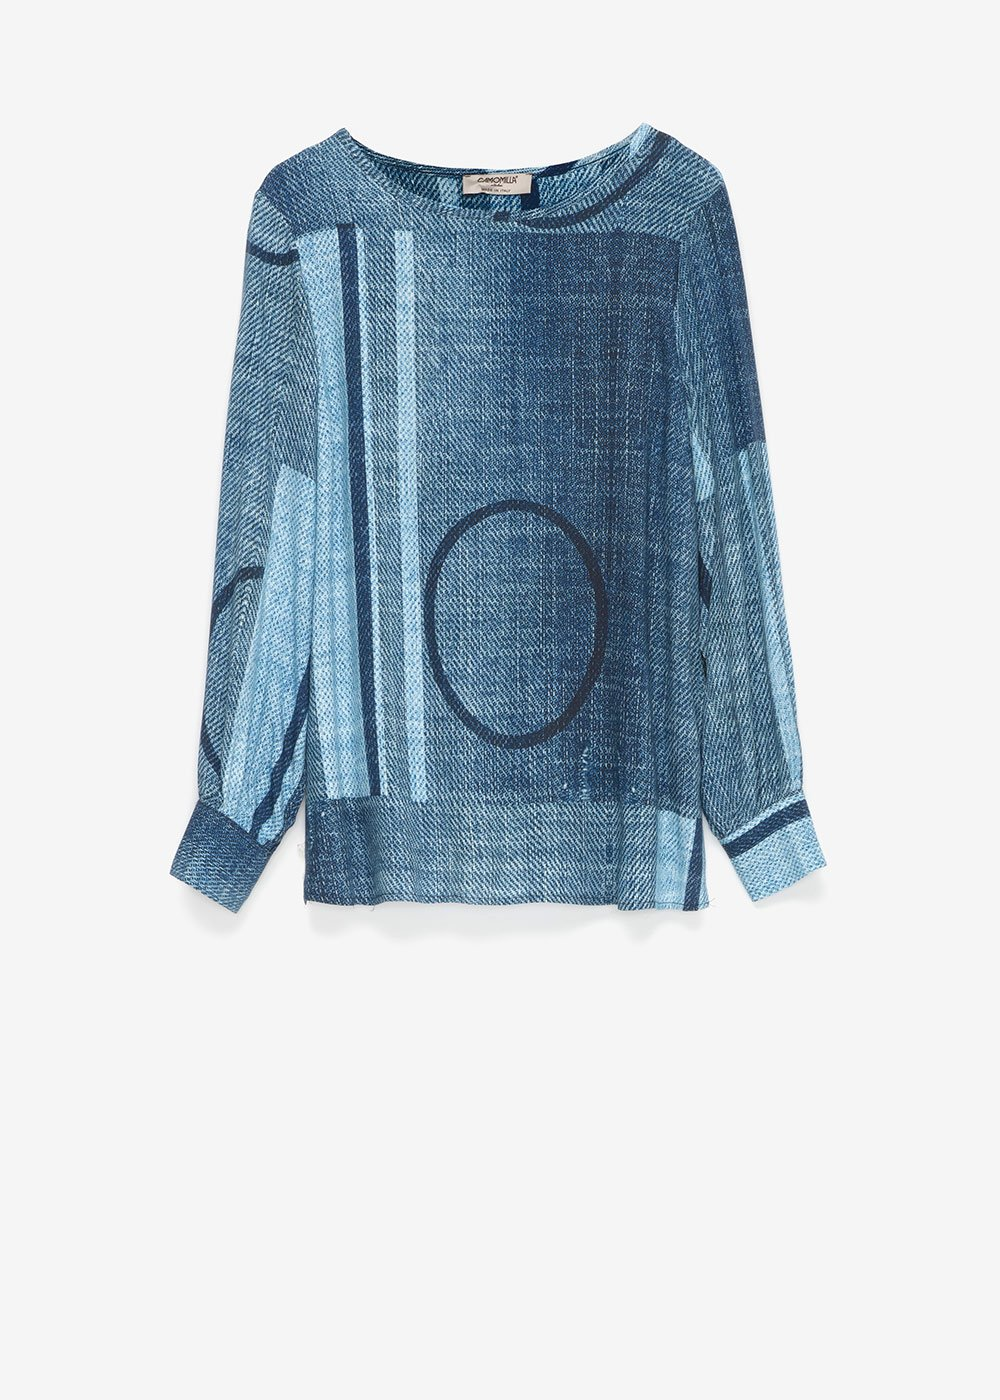 Sophie denim-effect t-shirt - Oltremare / Fog Multi - Woman